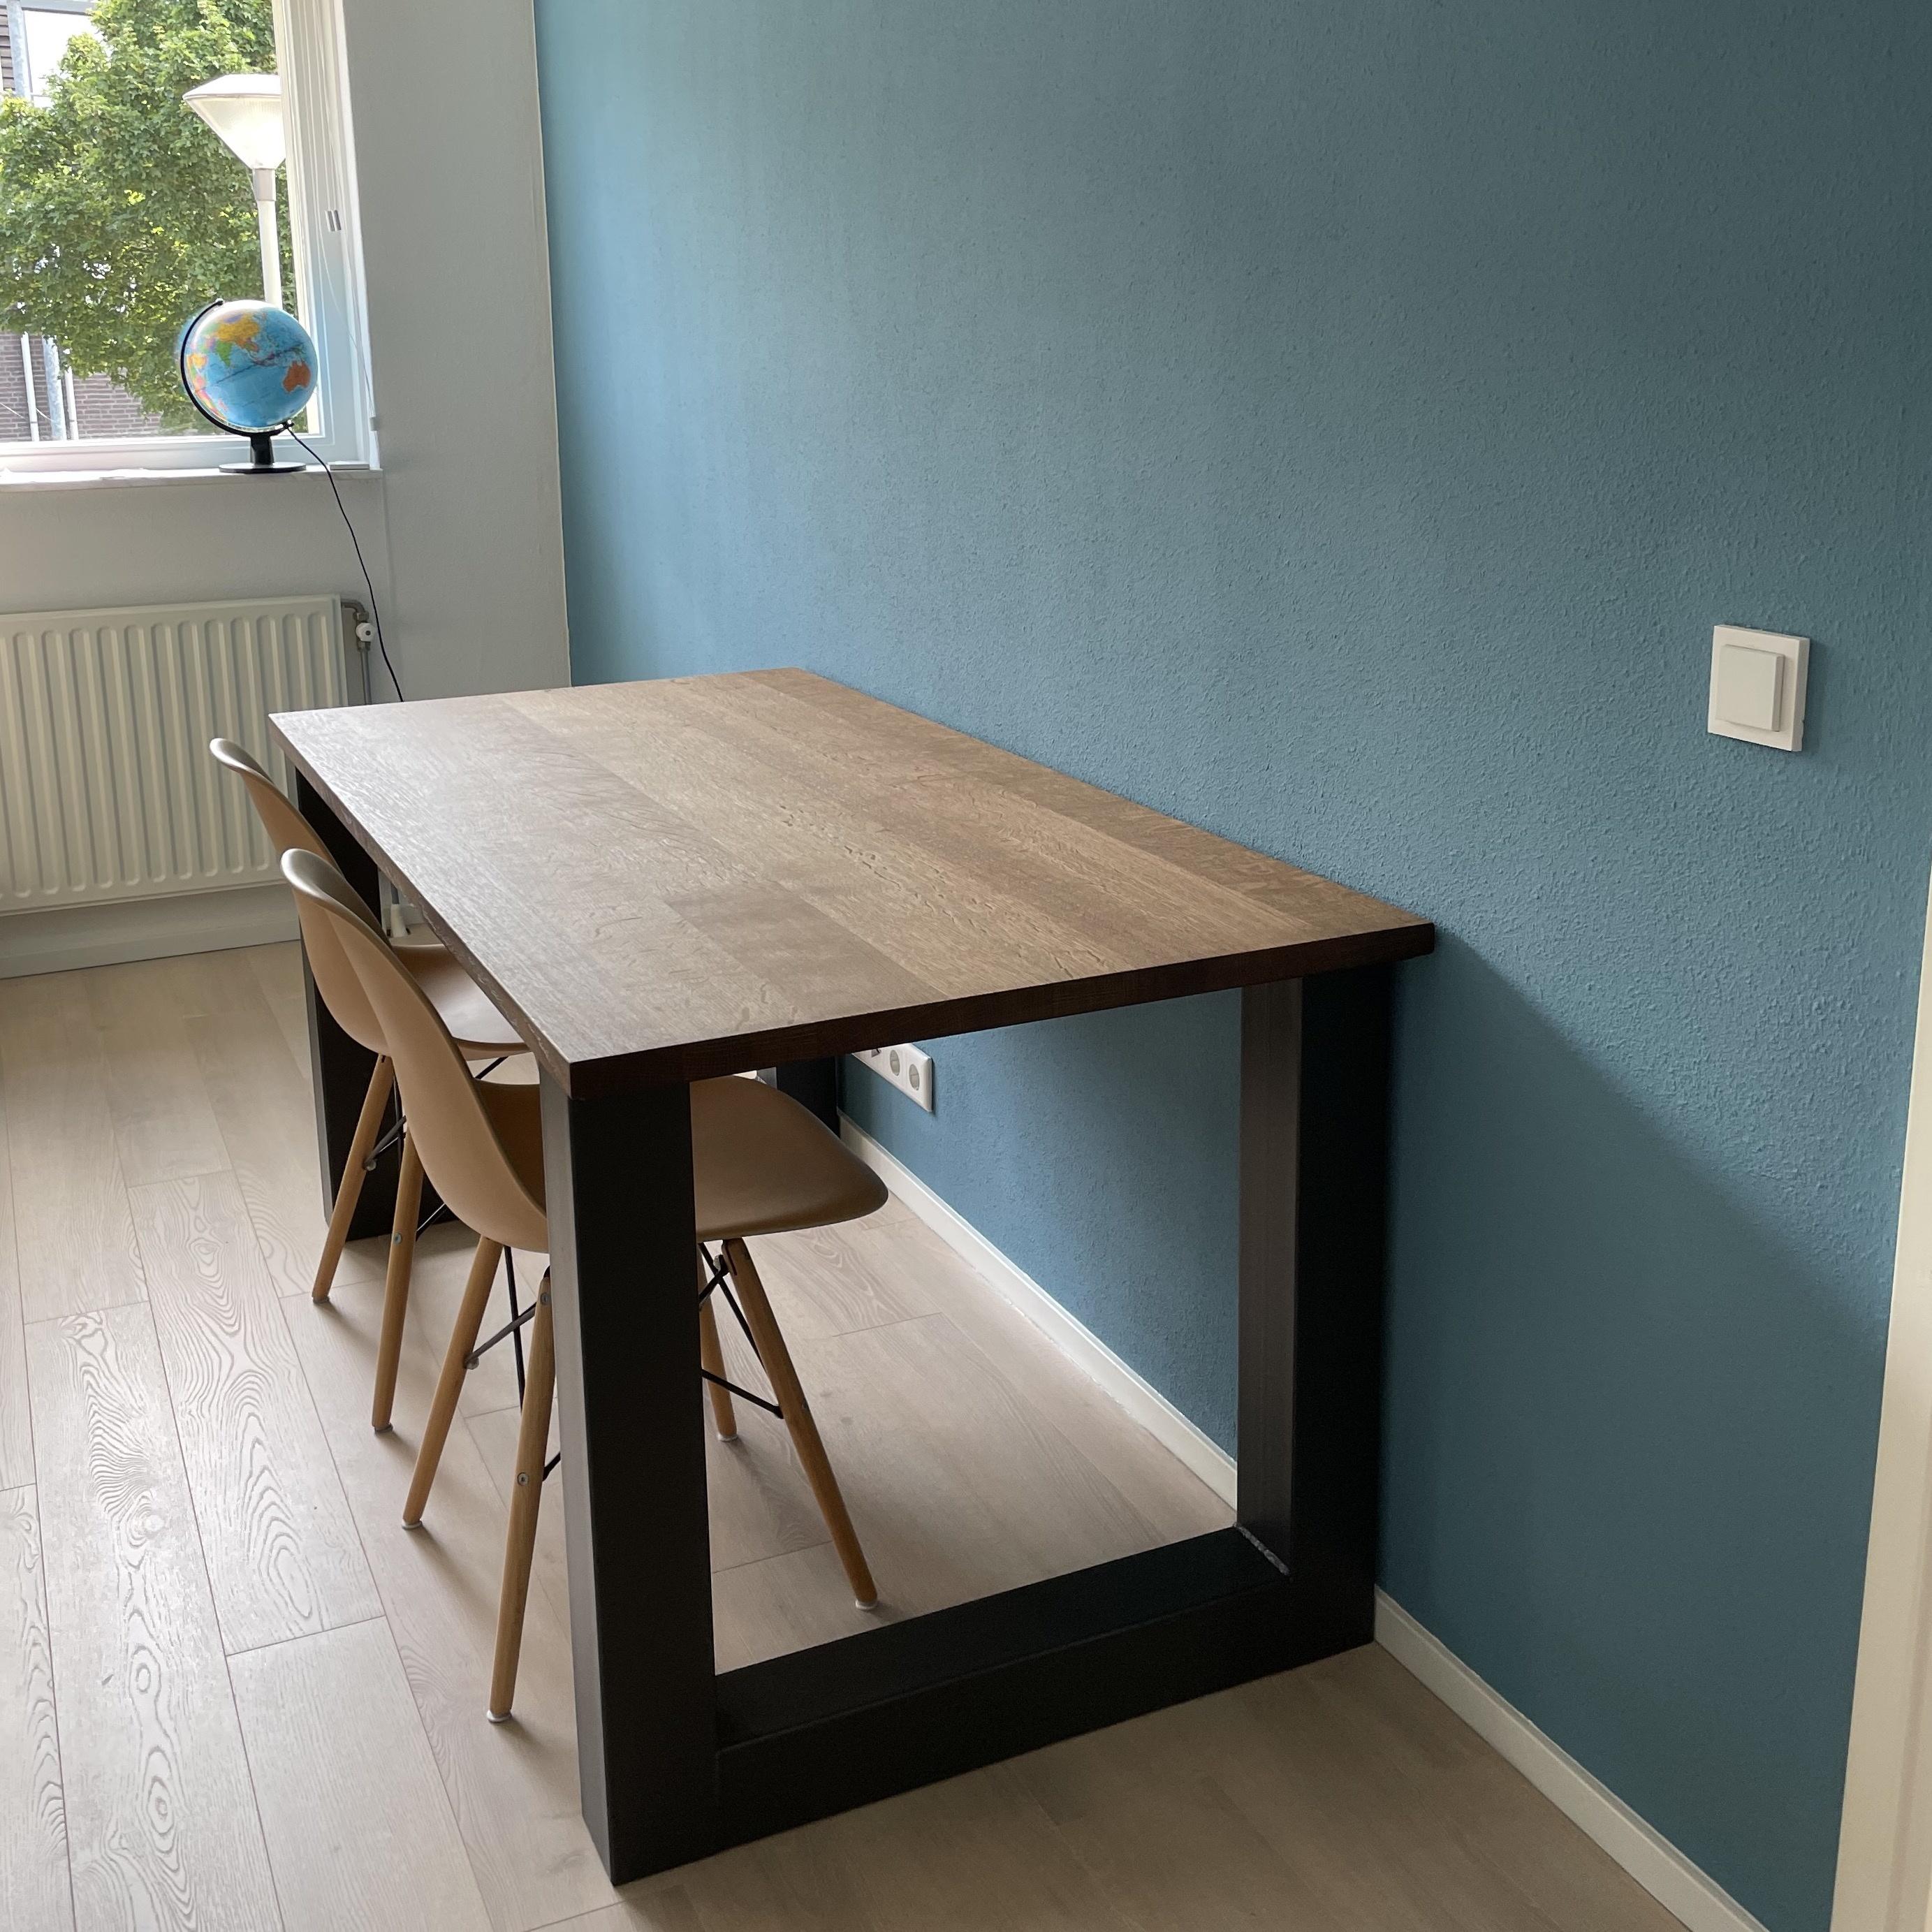 Eiken tafelblad op maat - 3 cm dik (1-laag) - foutvrij Europees eikenhout - verlijmd kd 8-12% - 50-120x50-350 cm